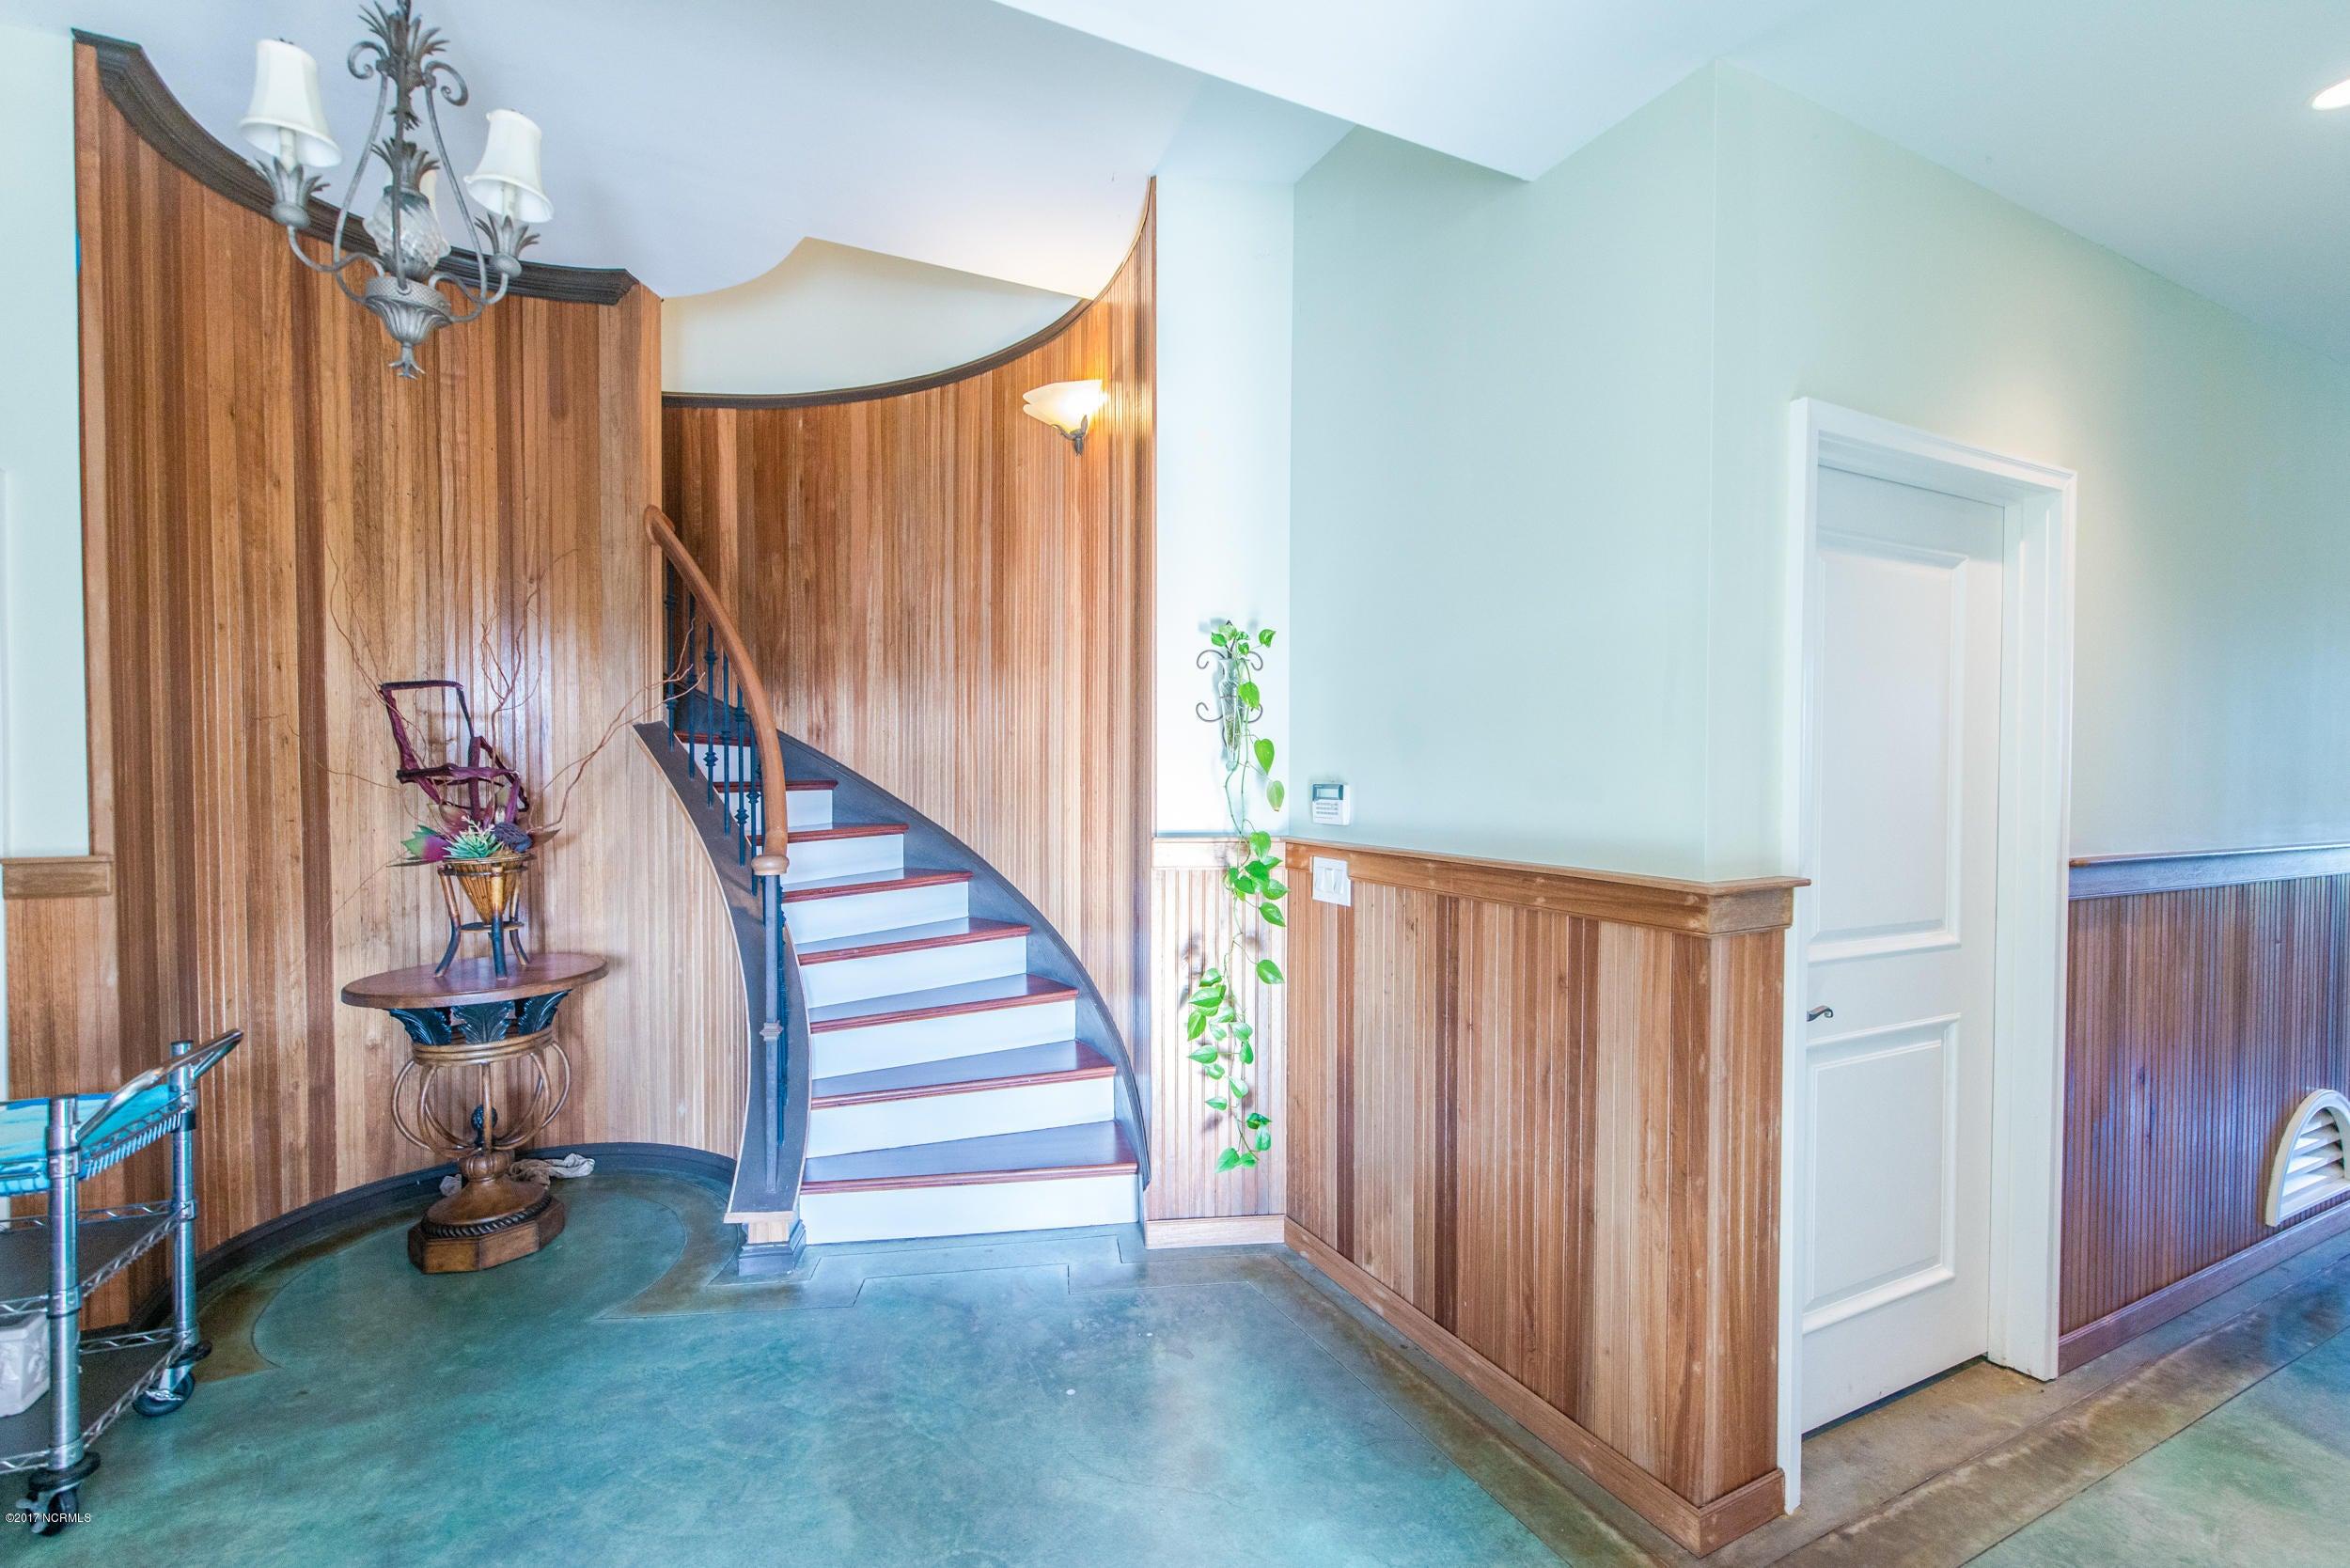 Ocean Isle Beach Real Estate - http://cdn.resize.sparkplatform.com/ncr/1024x768/true/20170829153356516667000000-o.jpg